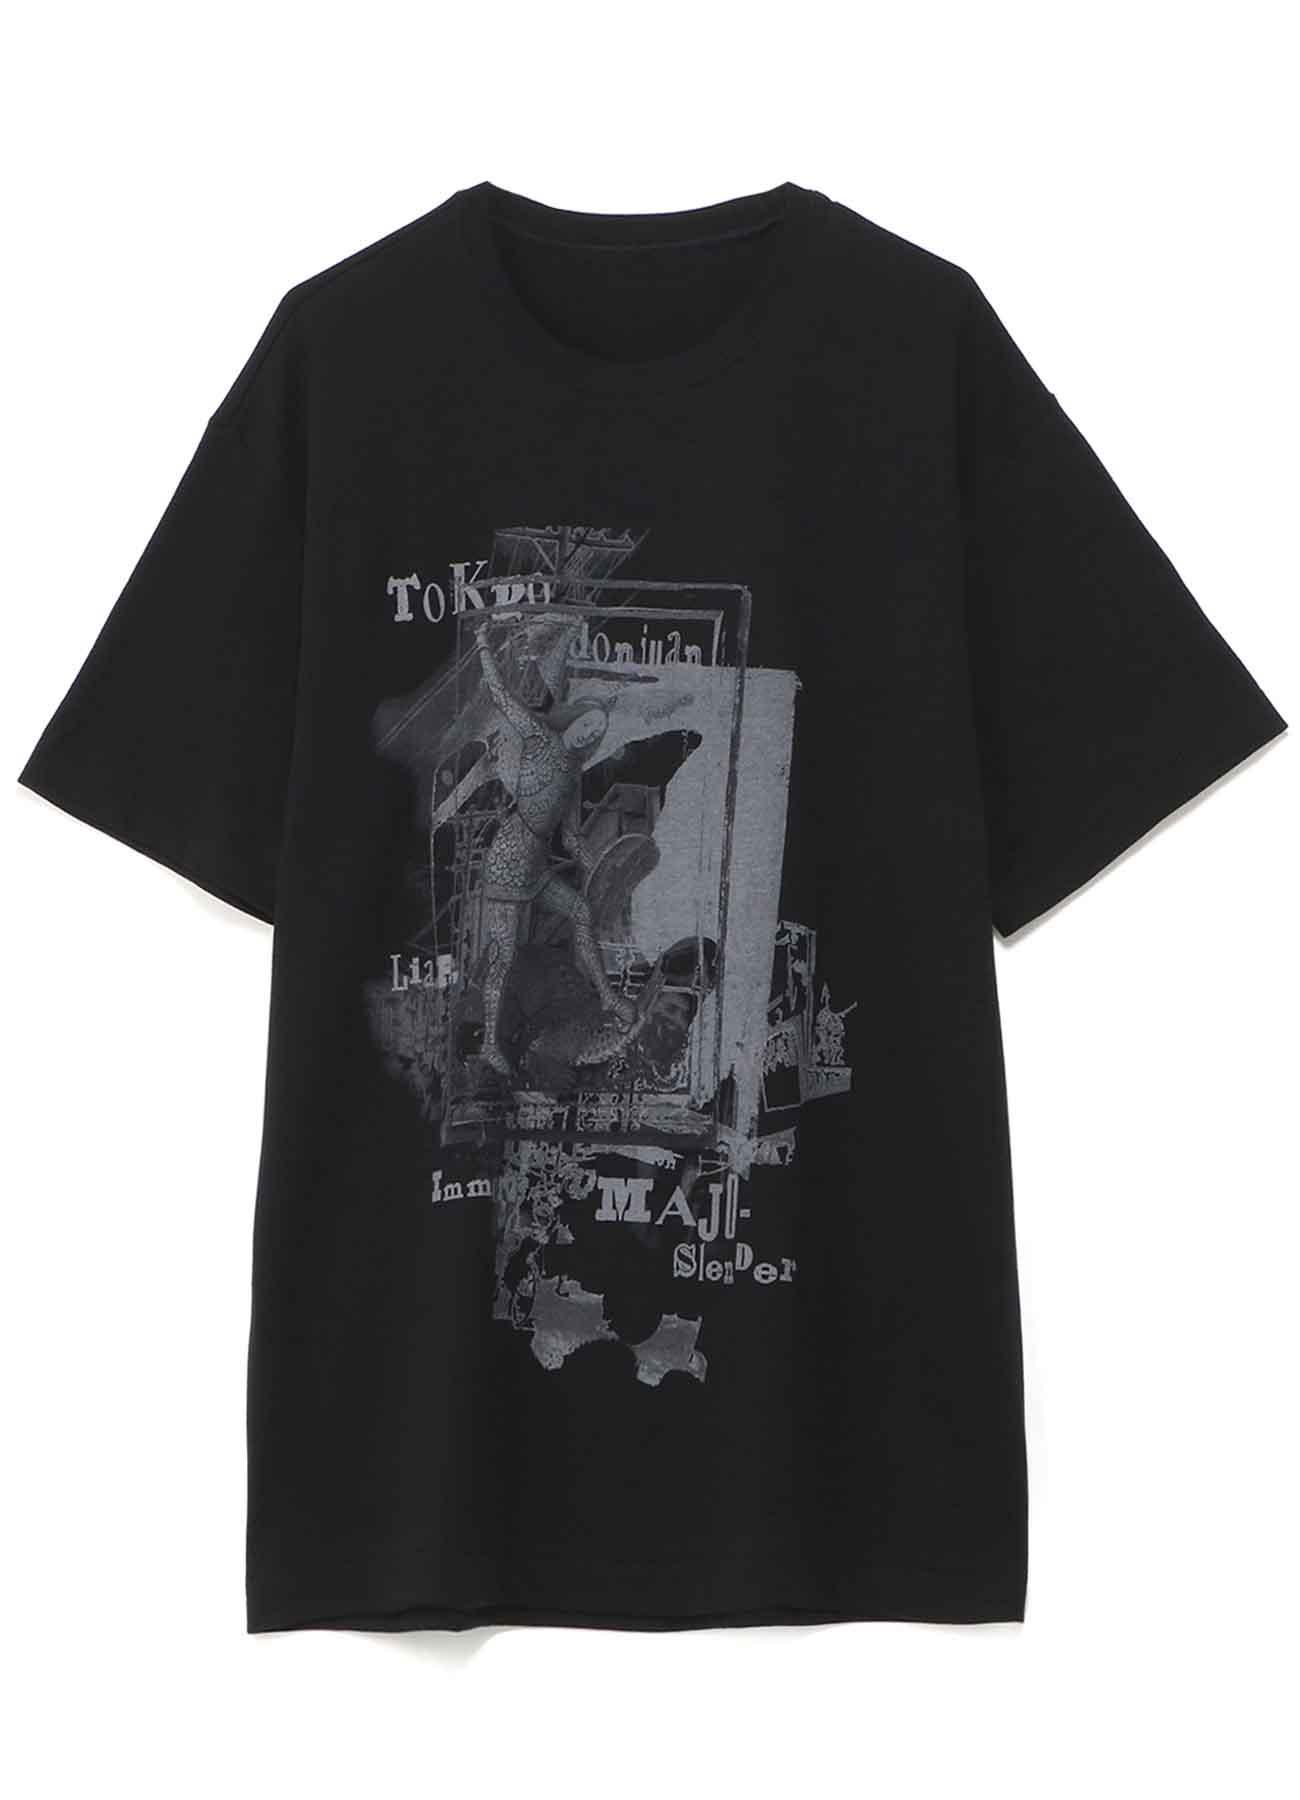 20/CottonJersey Tokyo Donjuan T-Shirt